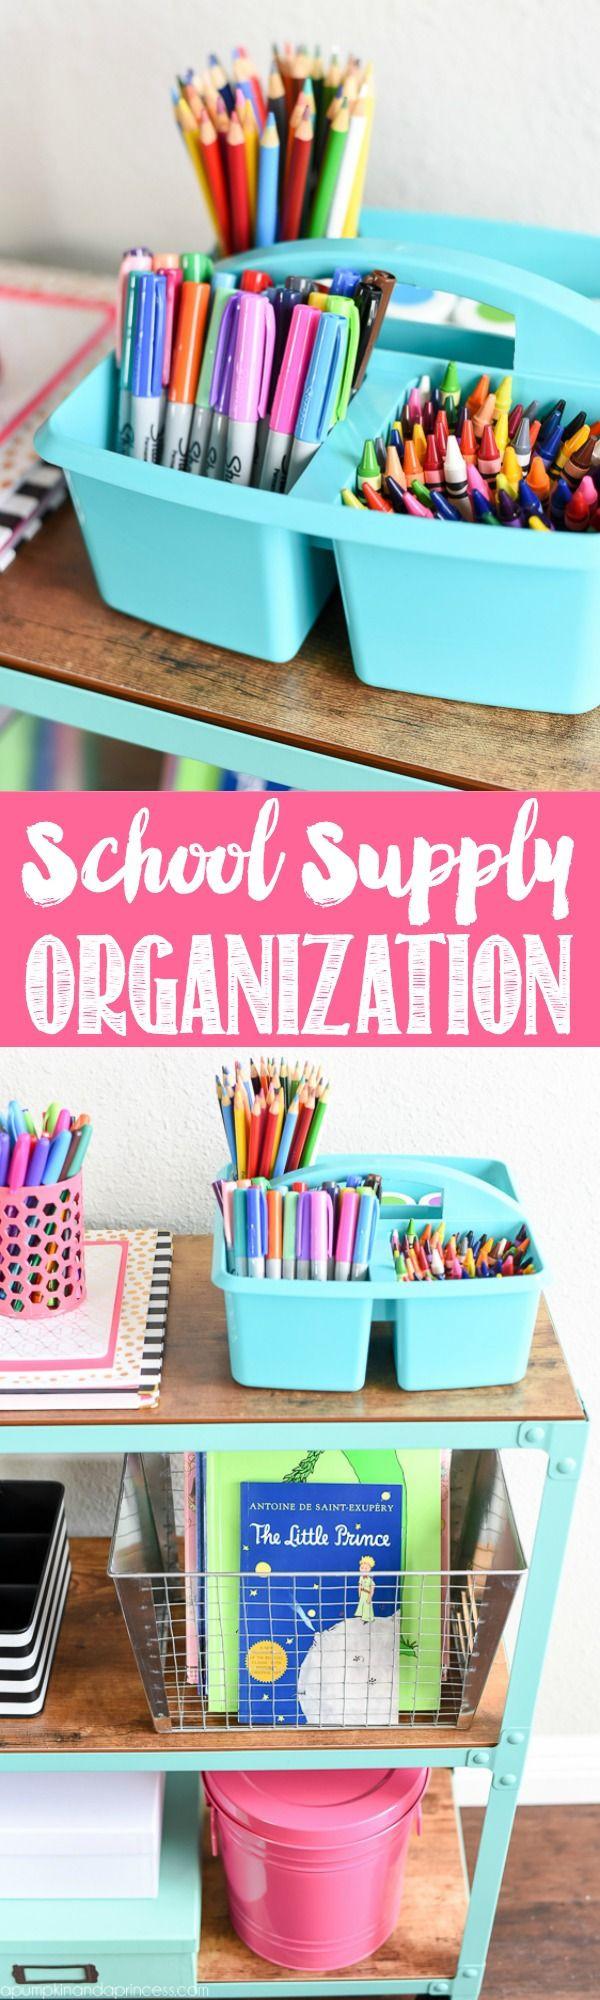 Best ideas about DIY School Organization Ideas . Save or Pin 25 best ideas about School desk organization on Pinterest Now.